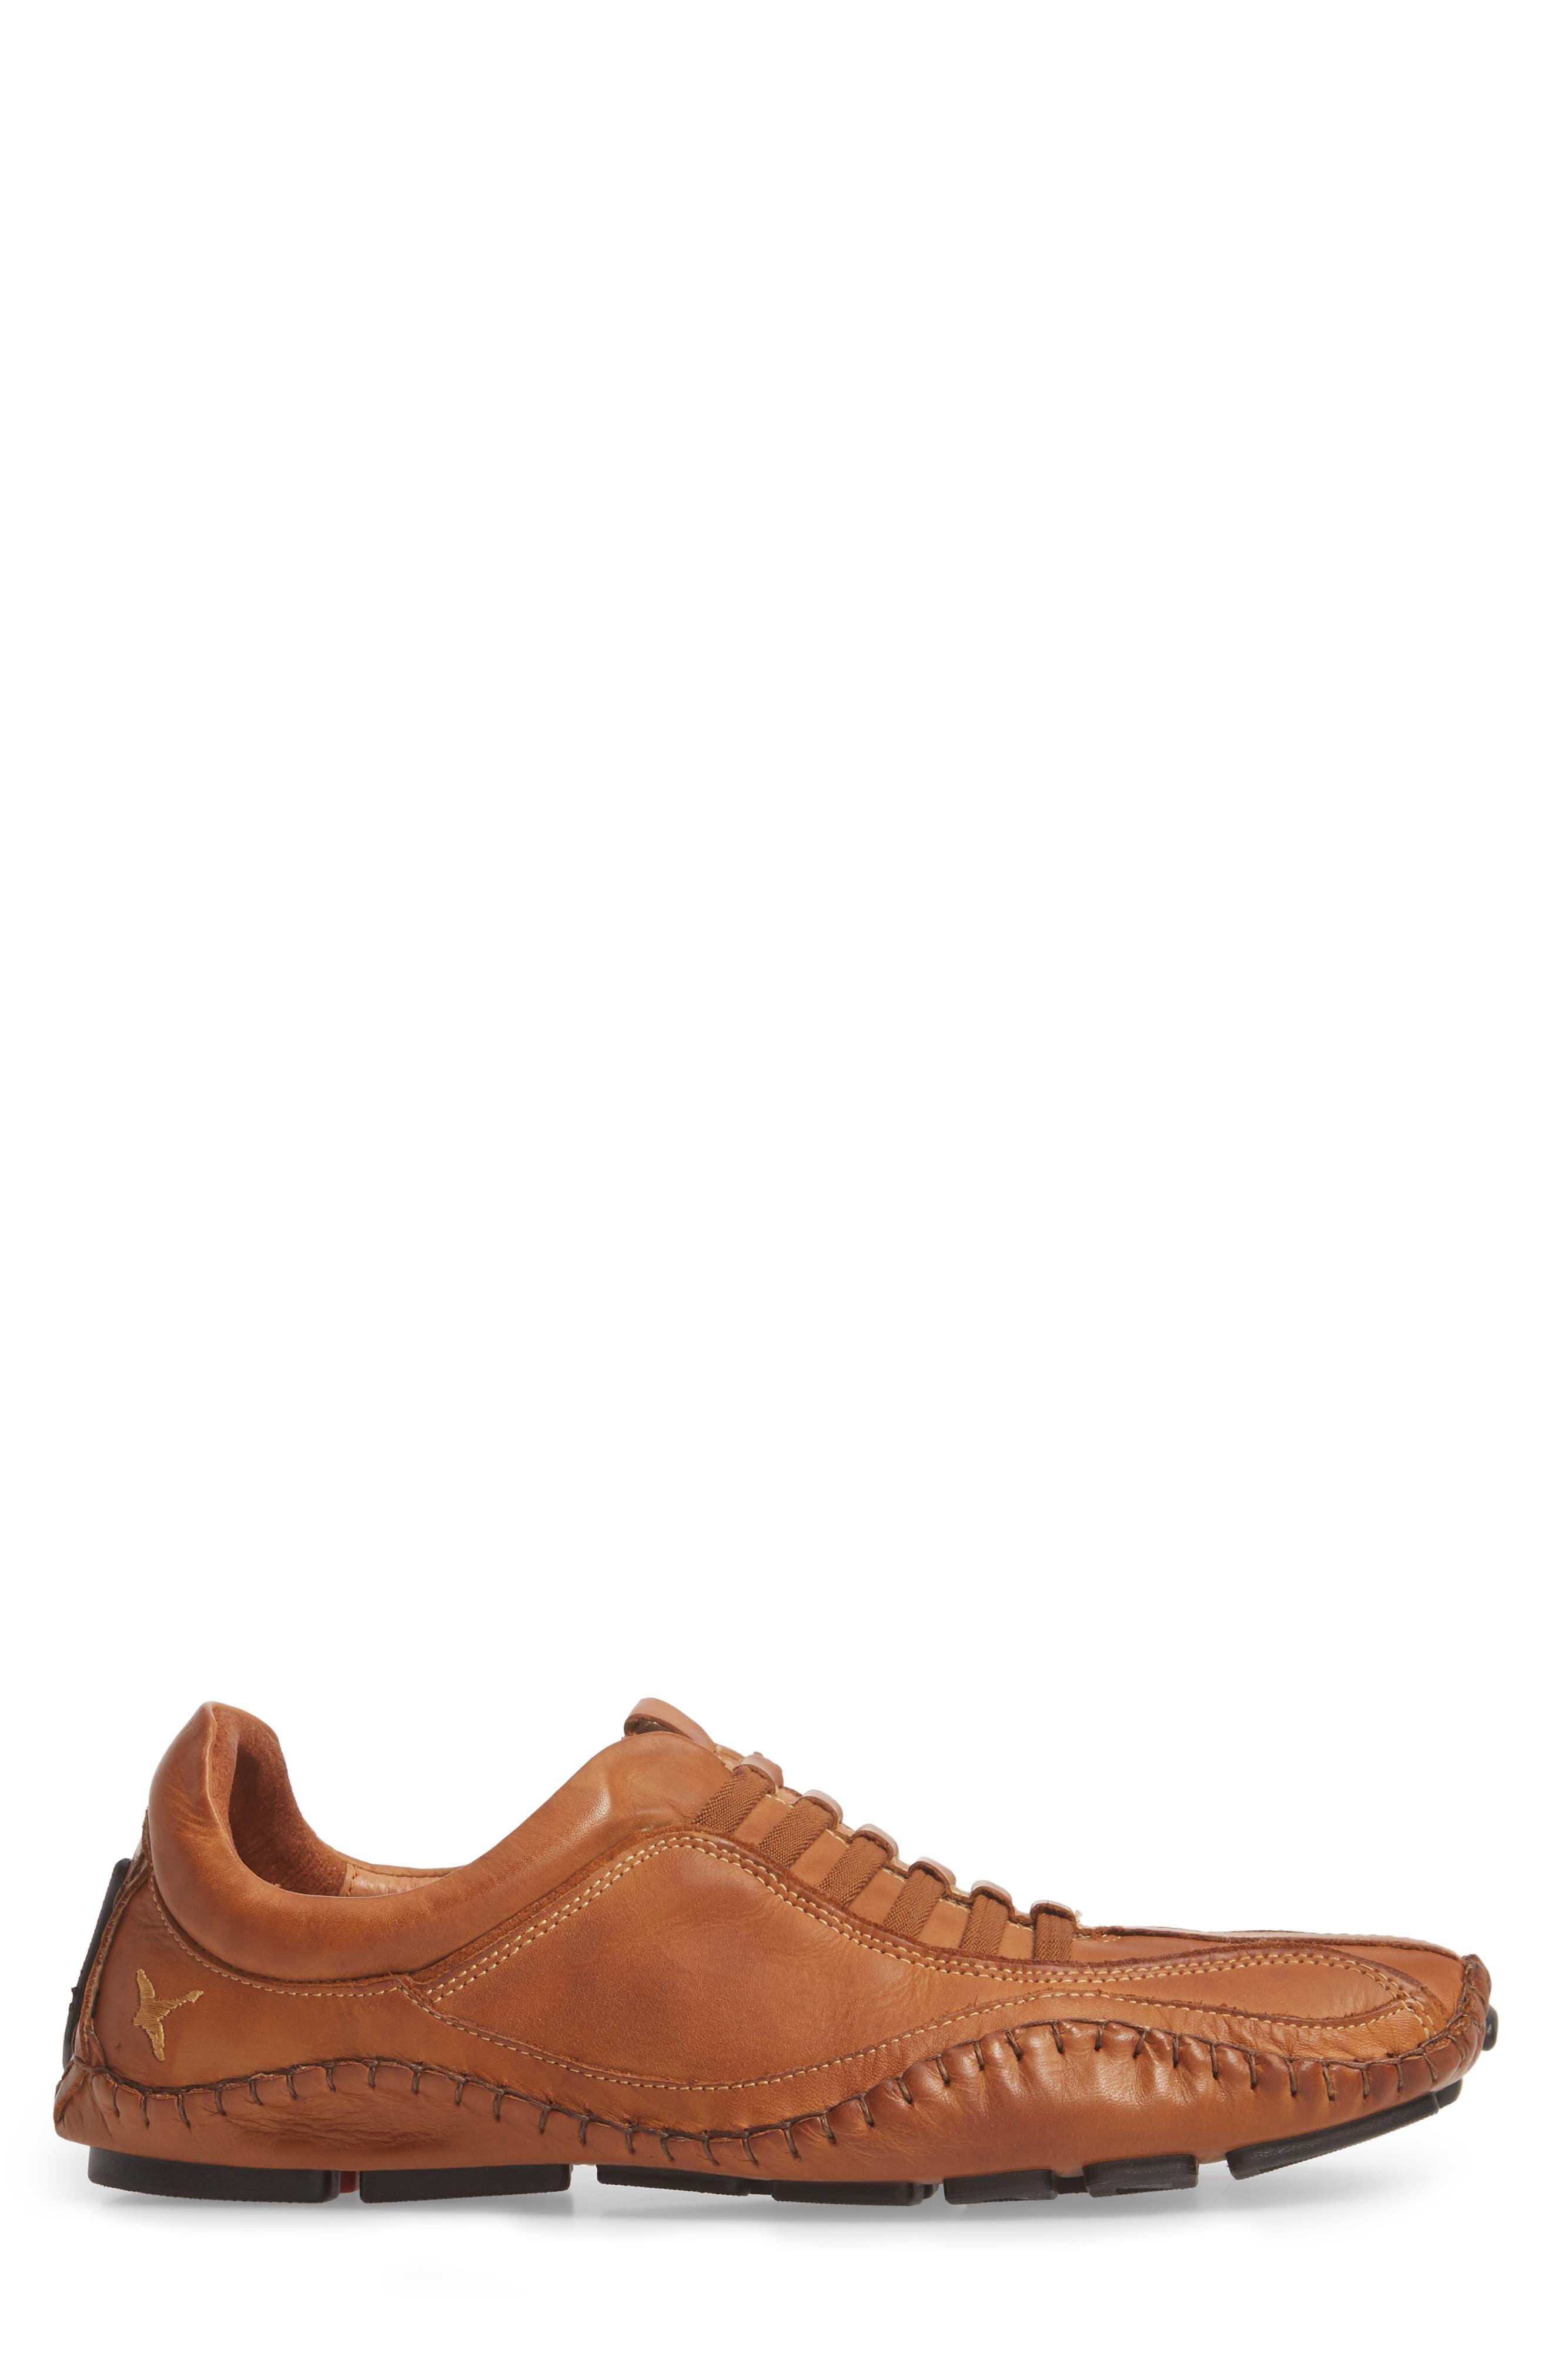 'Fuencarral' Driving Shoe,                             Alternate thumbnail 3, color,                             Light Brown